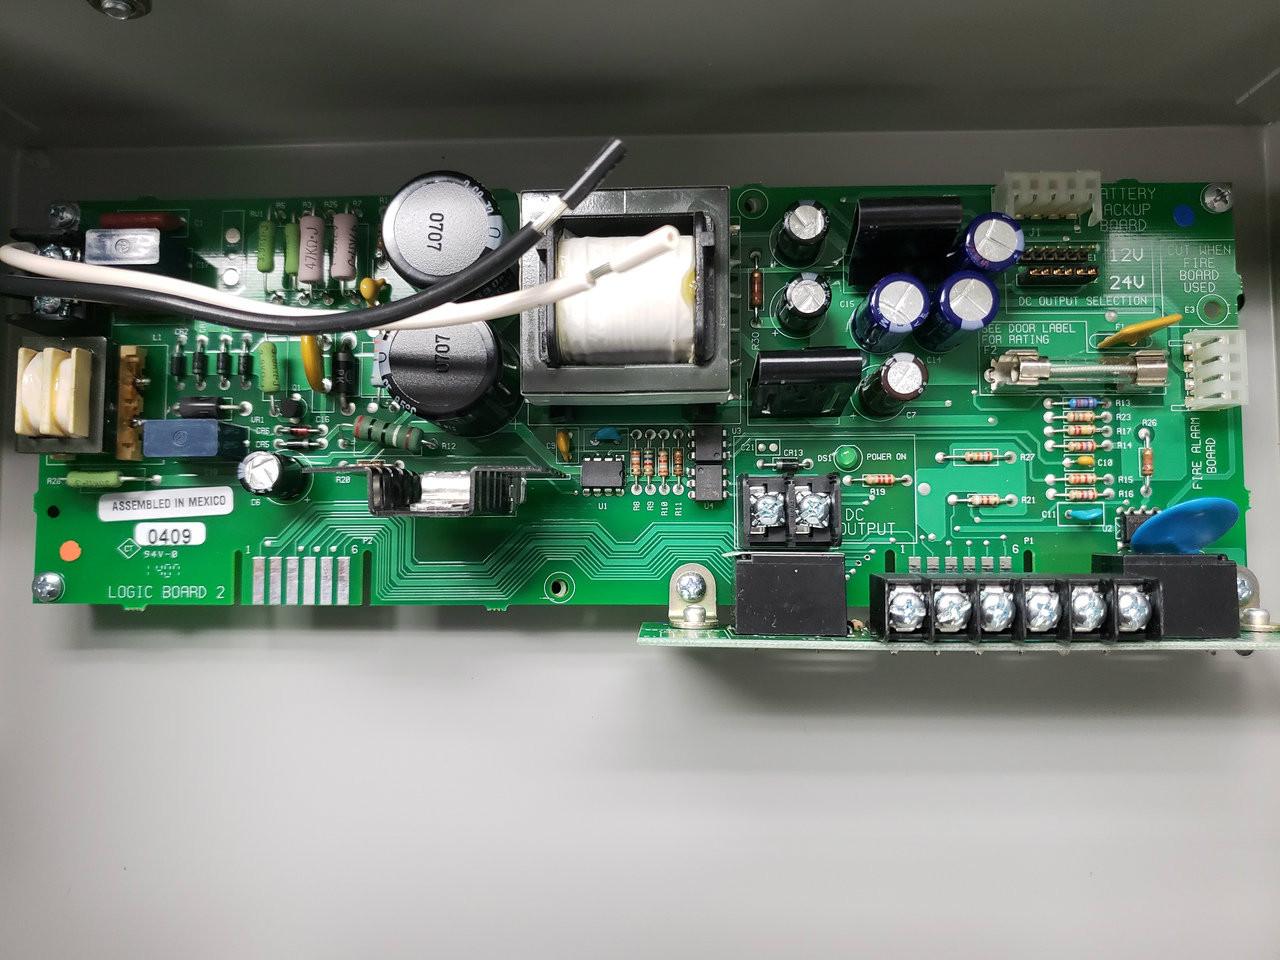 ps914 wiring diagram wiring diagrams  von duprin ps914 wiring diagram #10